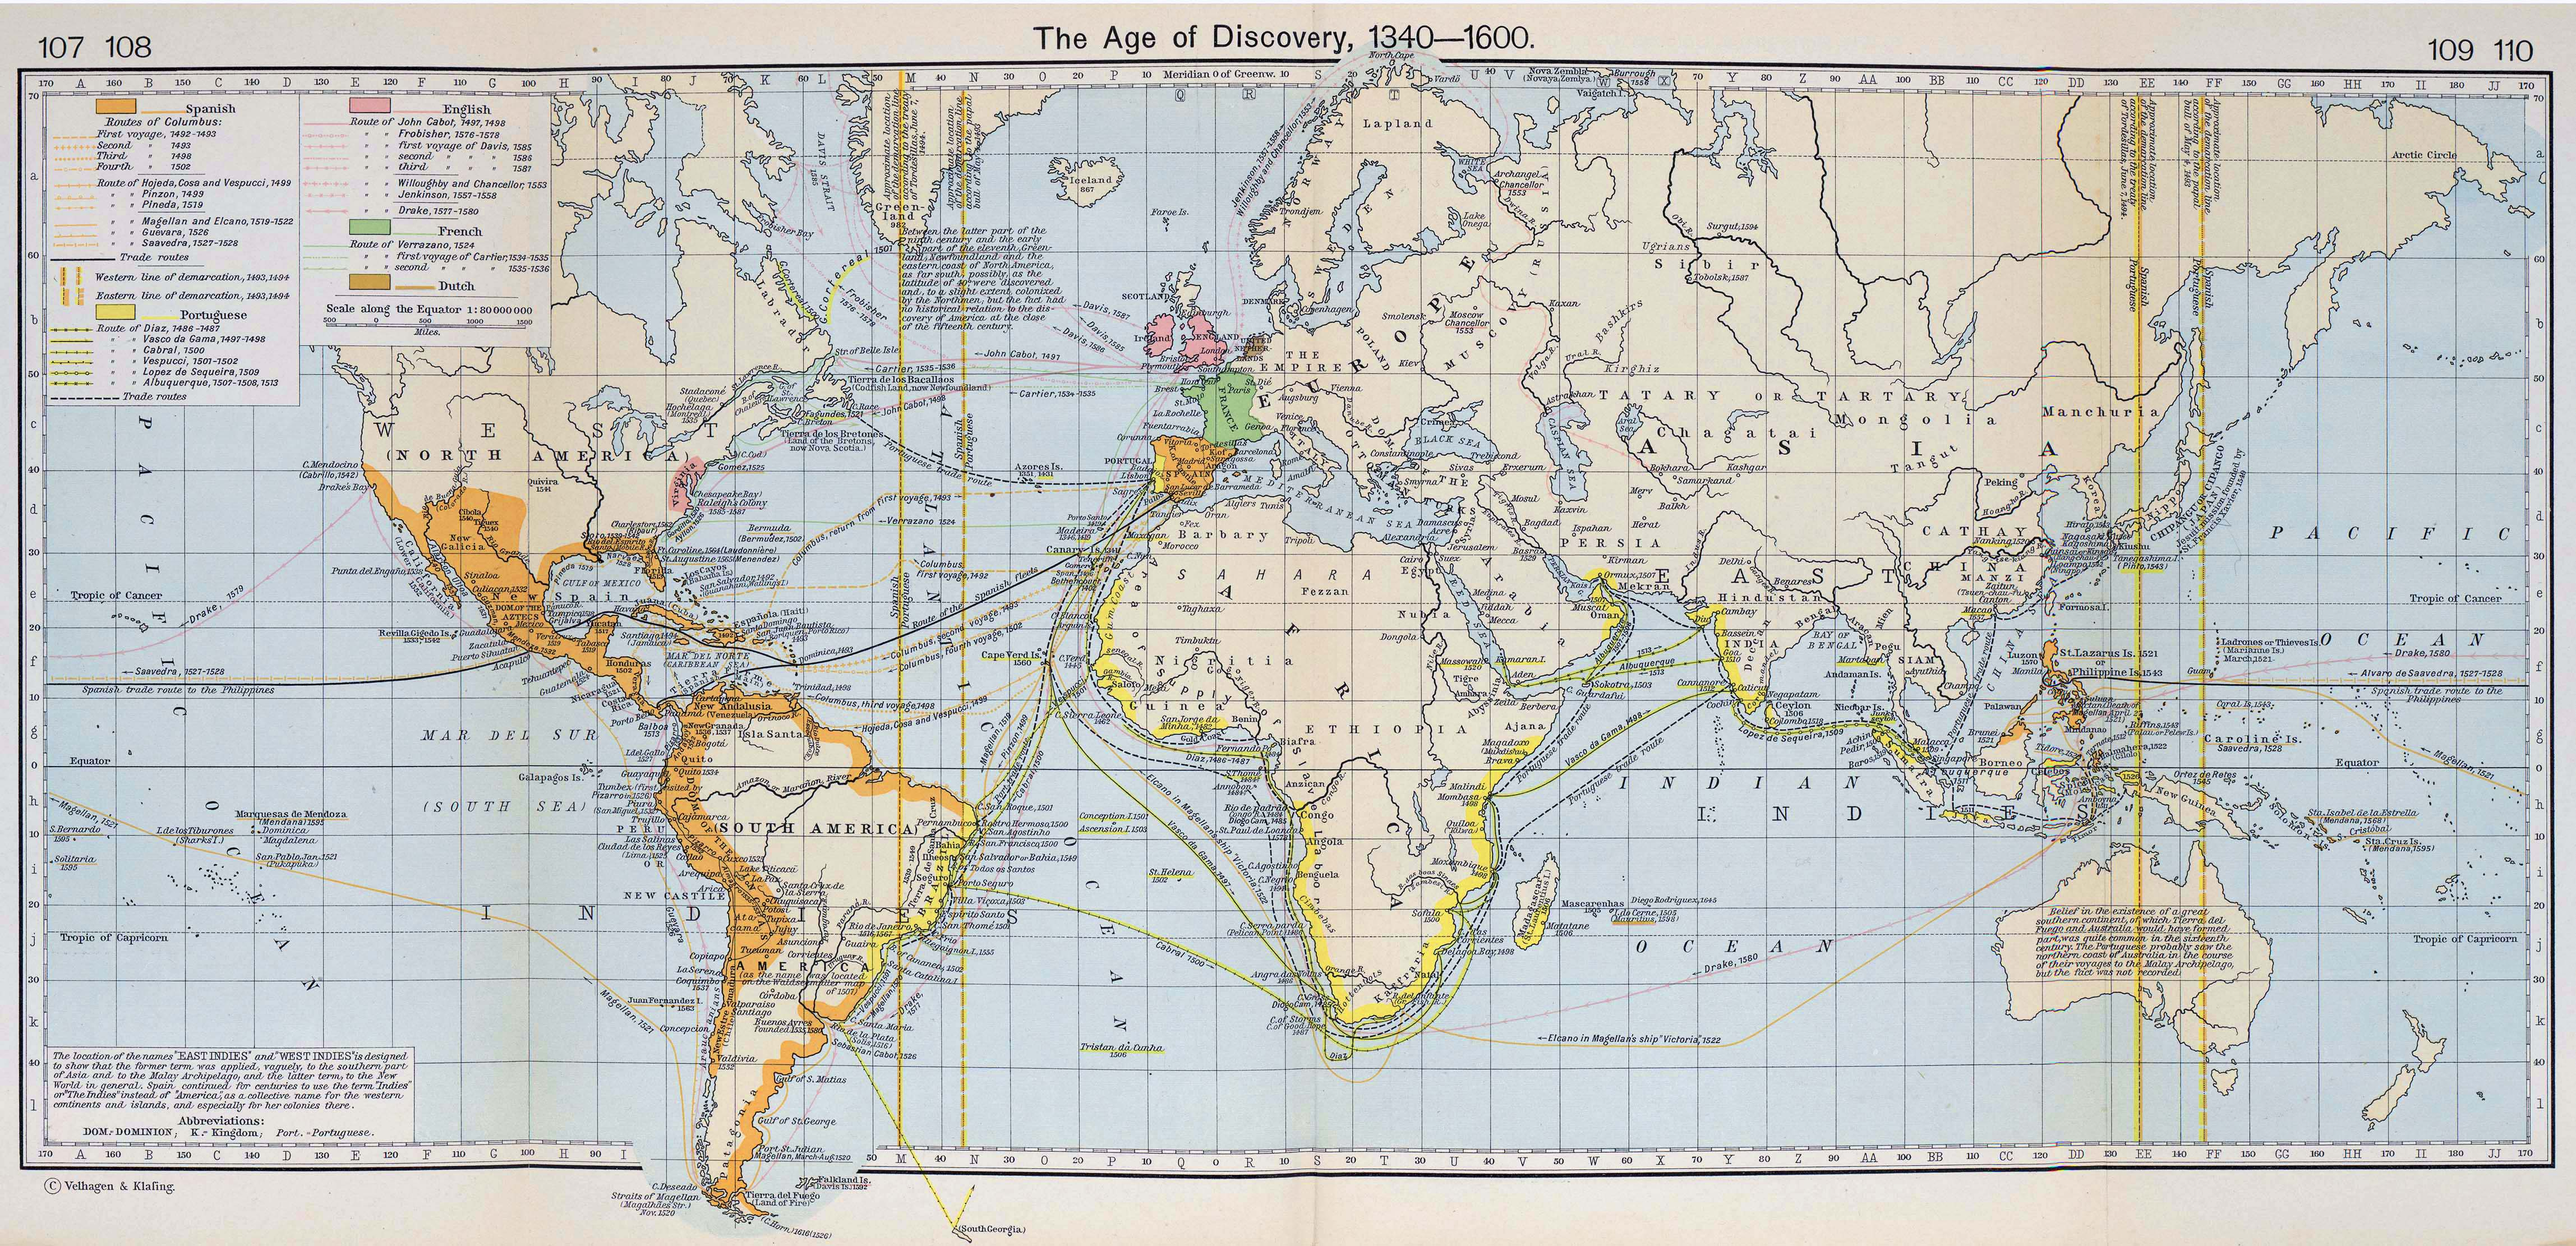 File:World 1340 1600.jpg - Wikimedia Commons